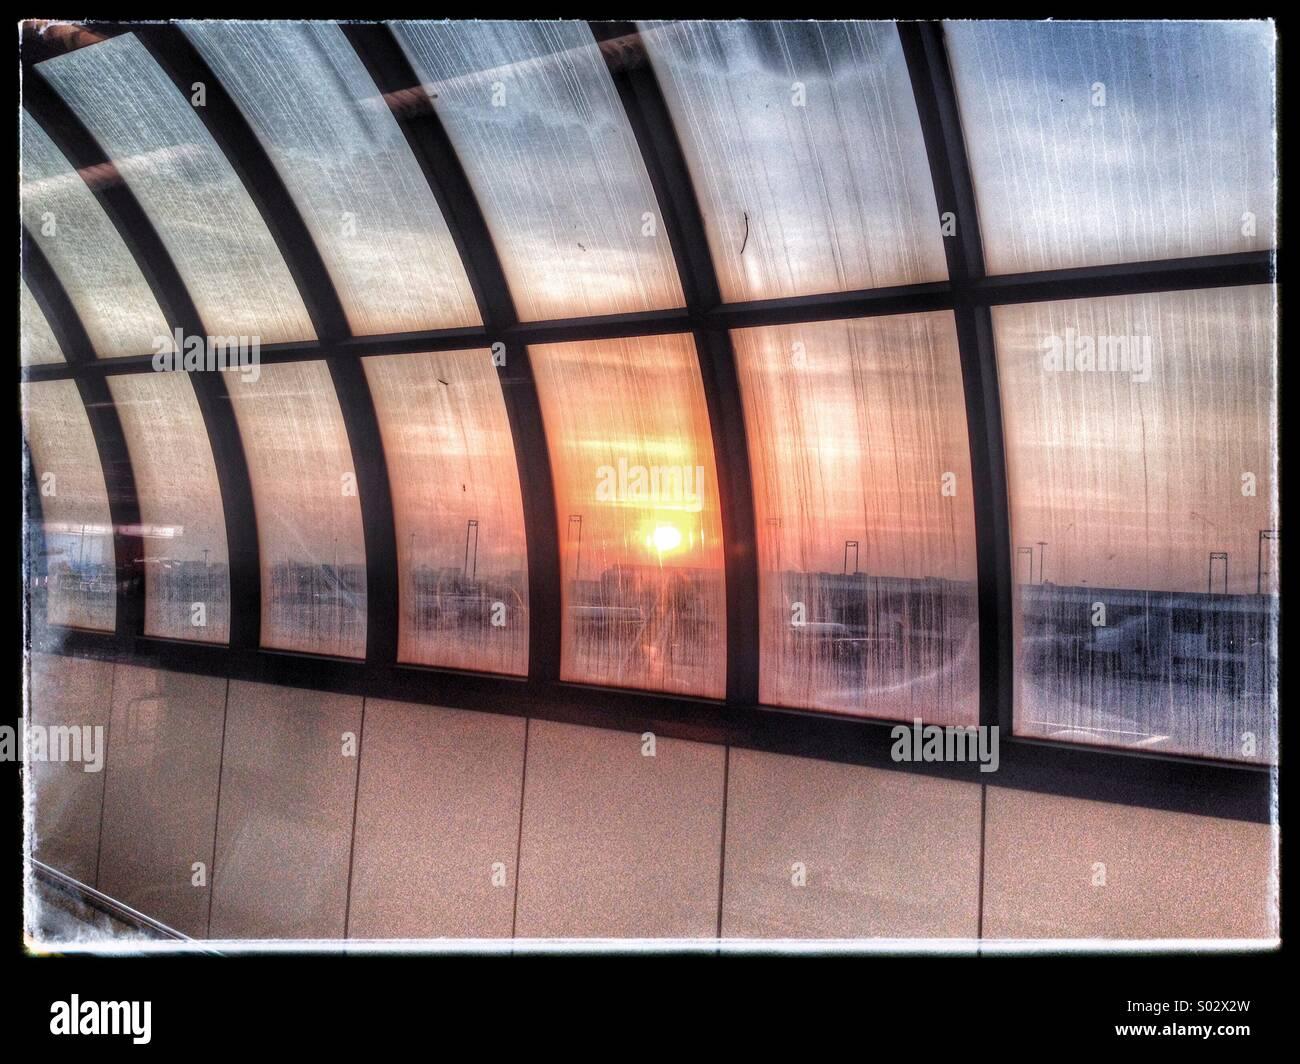 Fiumicino airport, Rome, Italy. - Stock Image